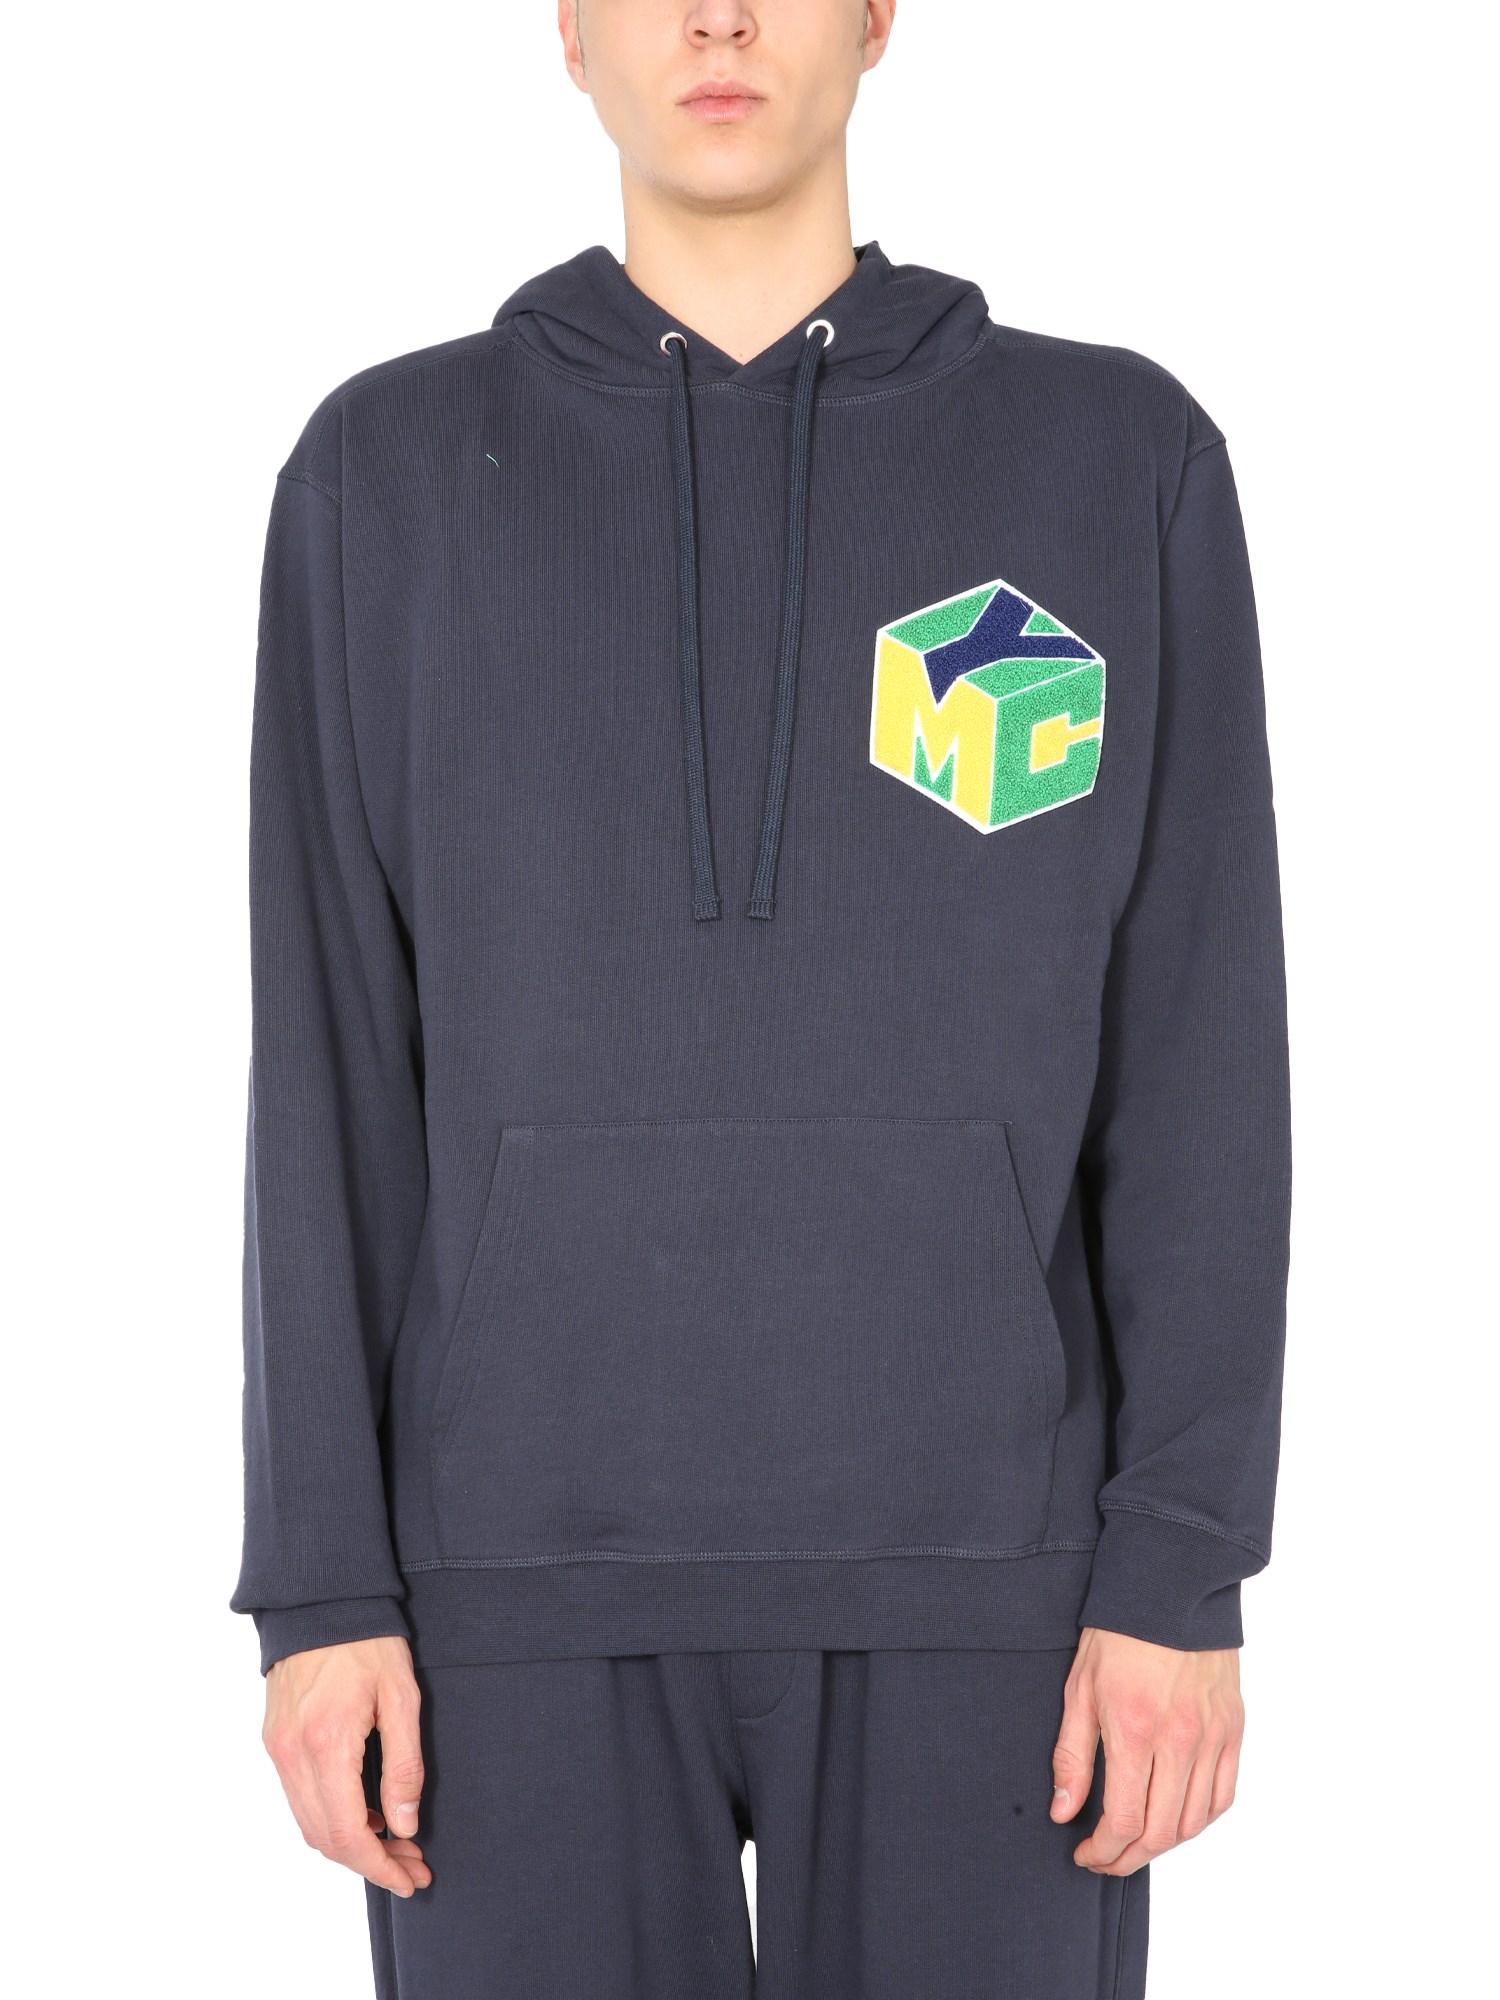 Ymc trugoy hooded sweatshirt - ymc - Modalova